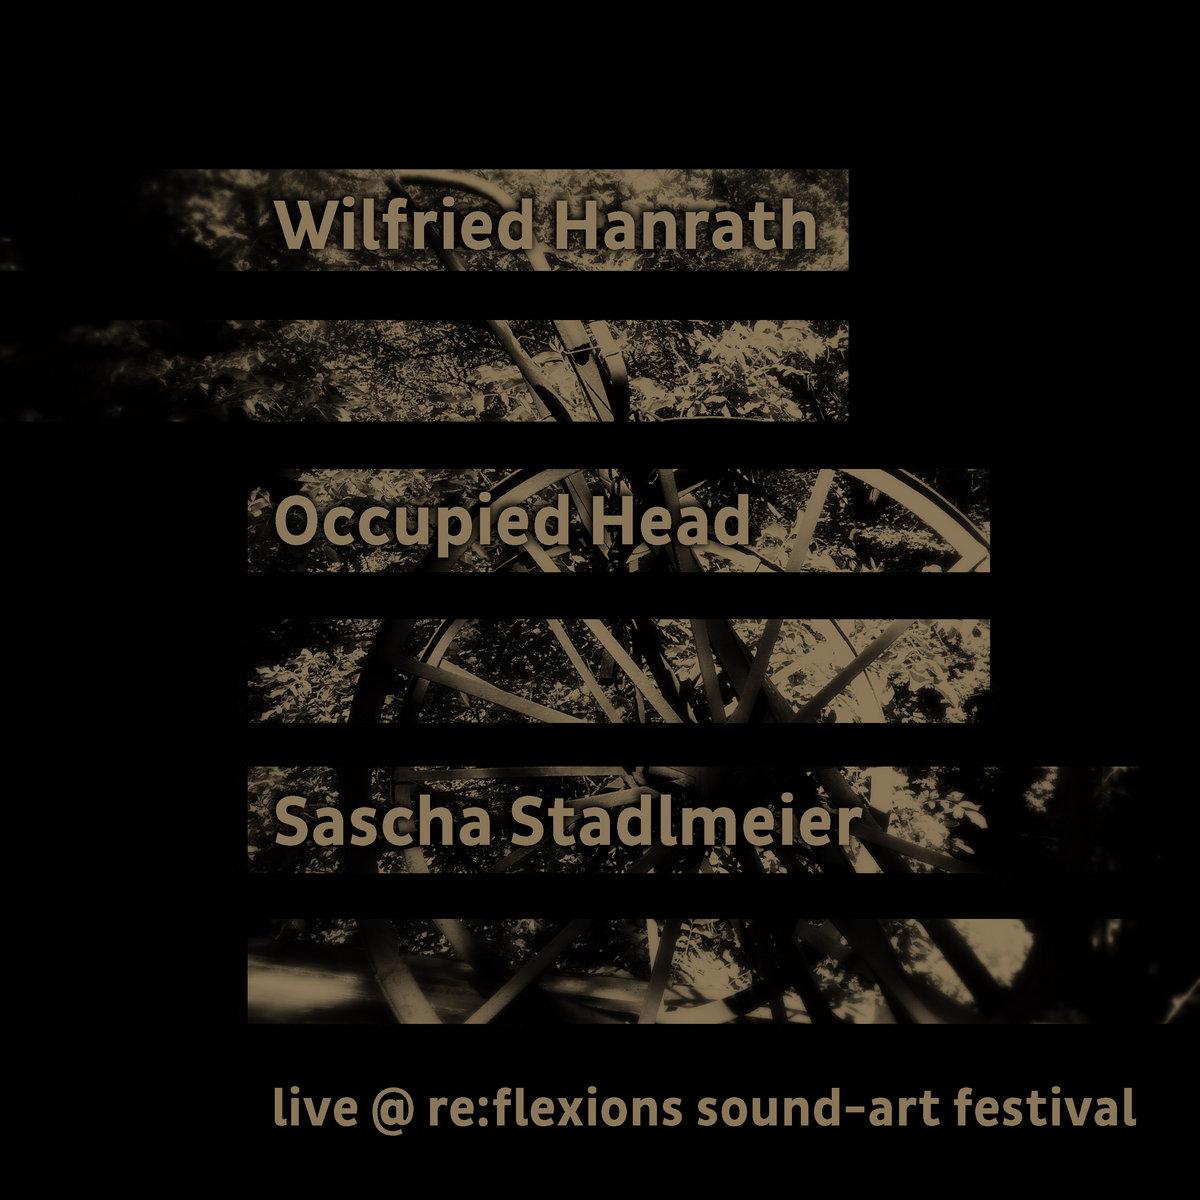 Wilfried Hanrath & Occupied Head & Sascha Stadlmeier – live @ re:flexions sound-art festival